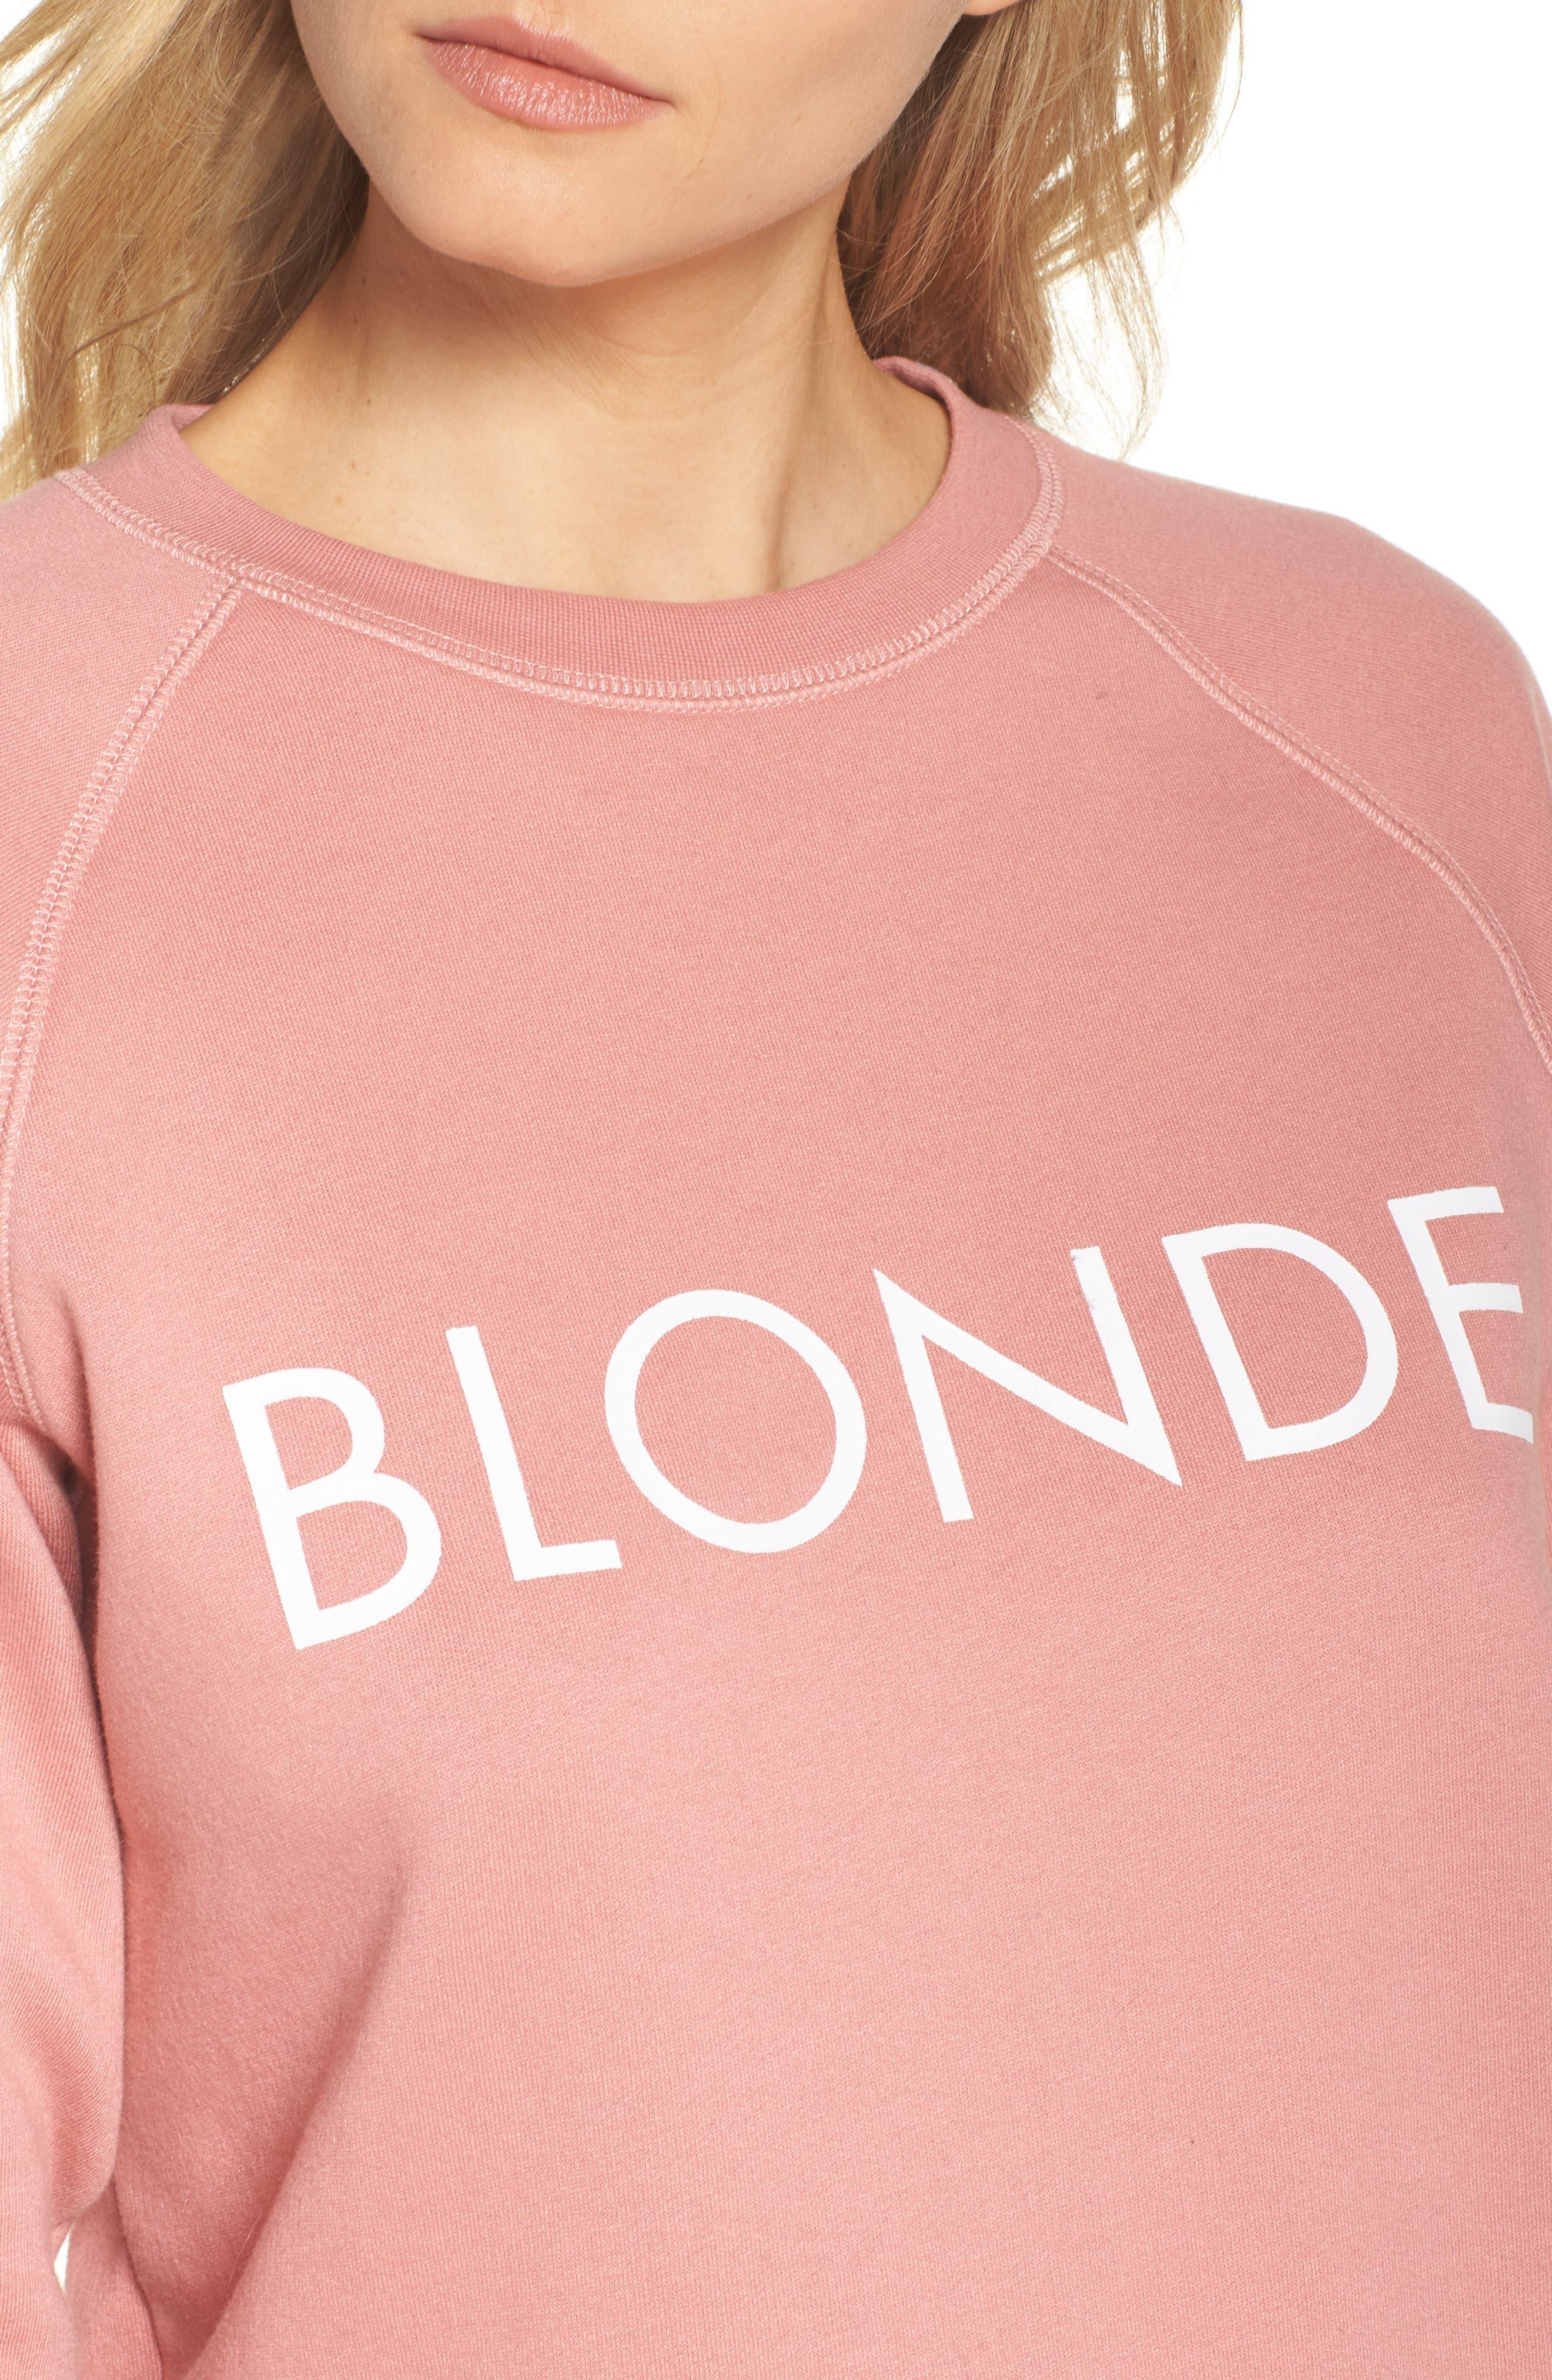 Blonde Crewneck Sweatshirt,                             Alternate thumbnail 4, color,